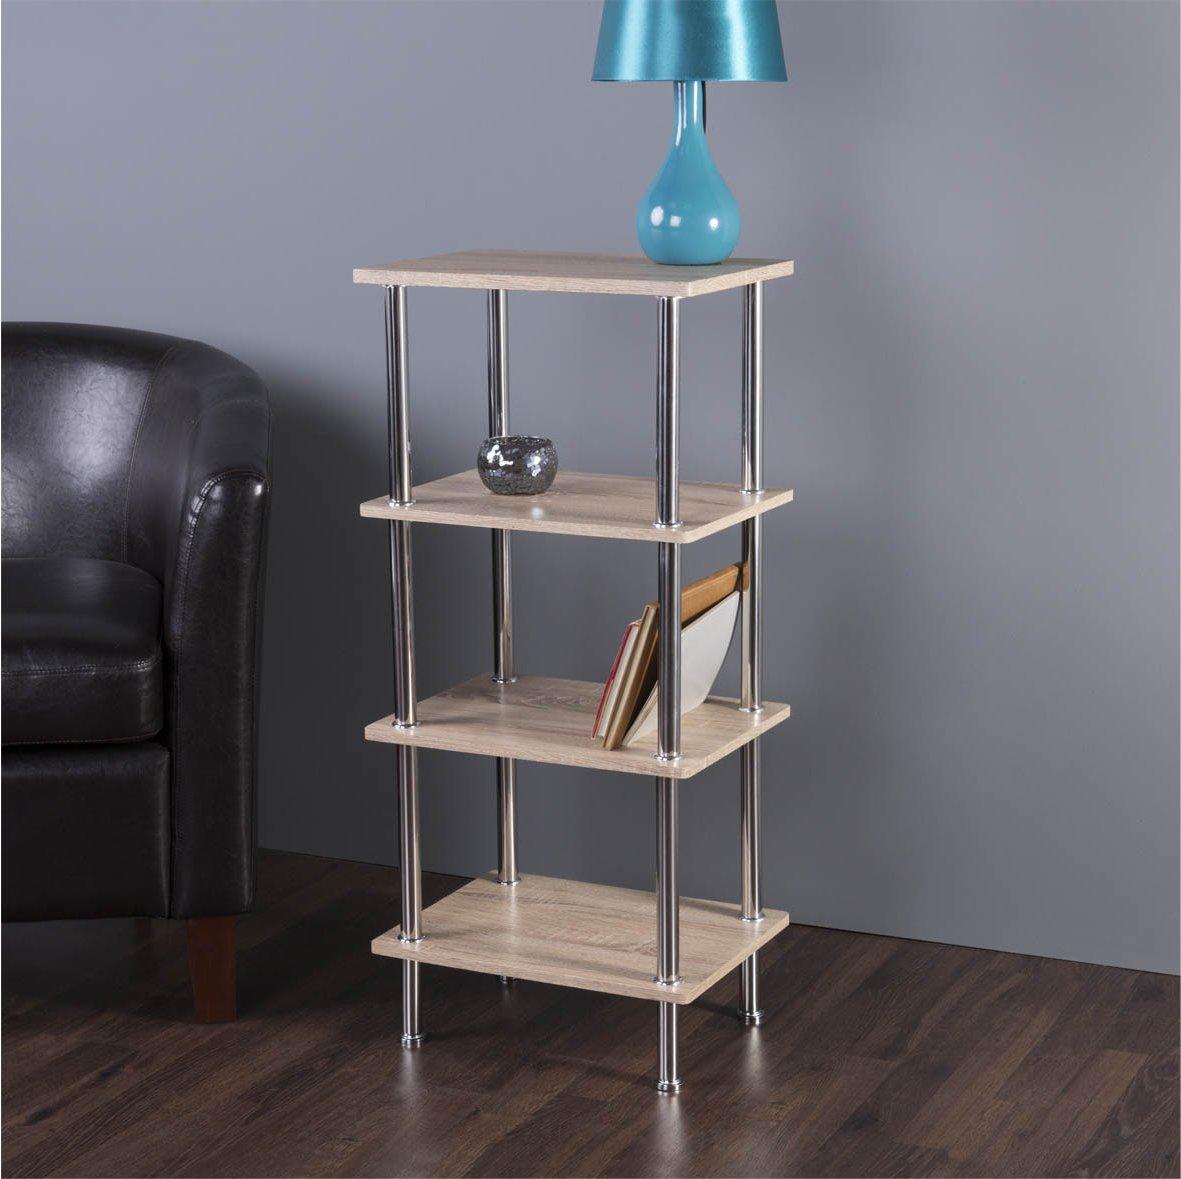 Avf s44wo bookcases cabinets for Avf furniture